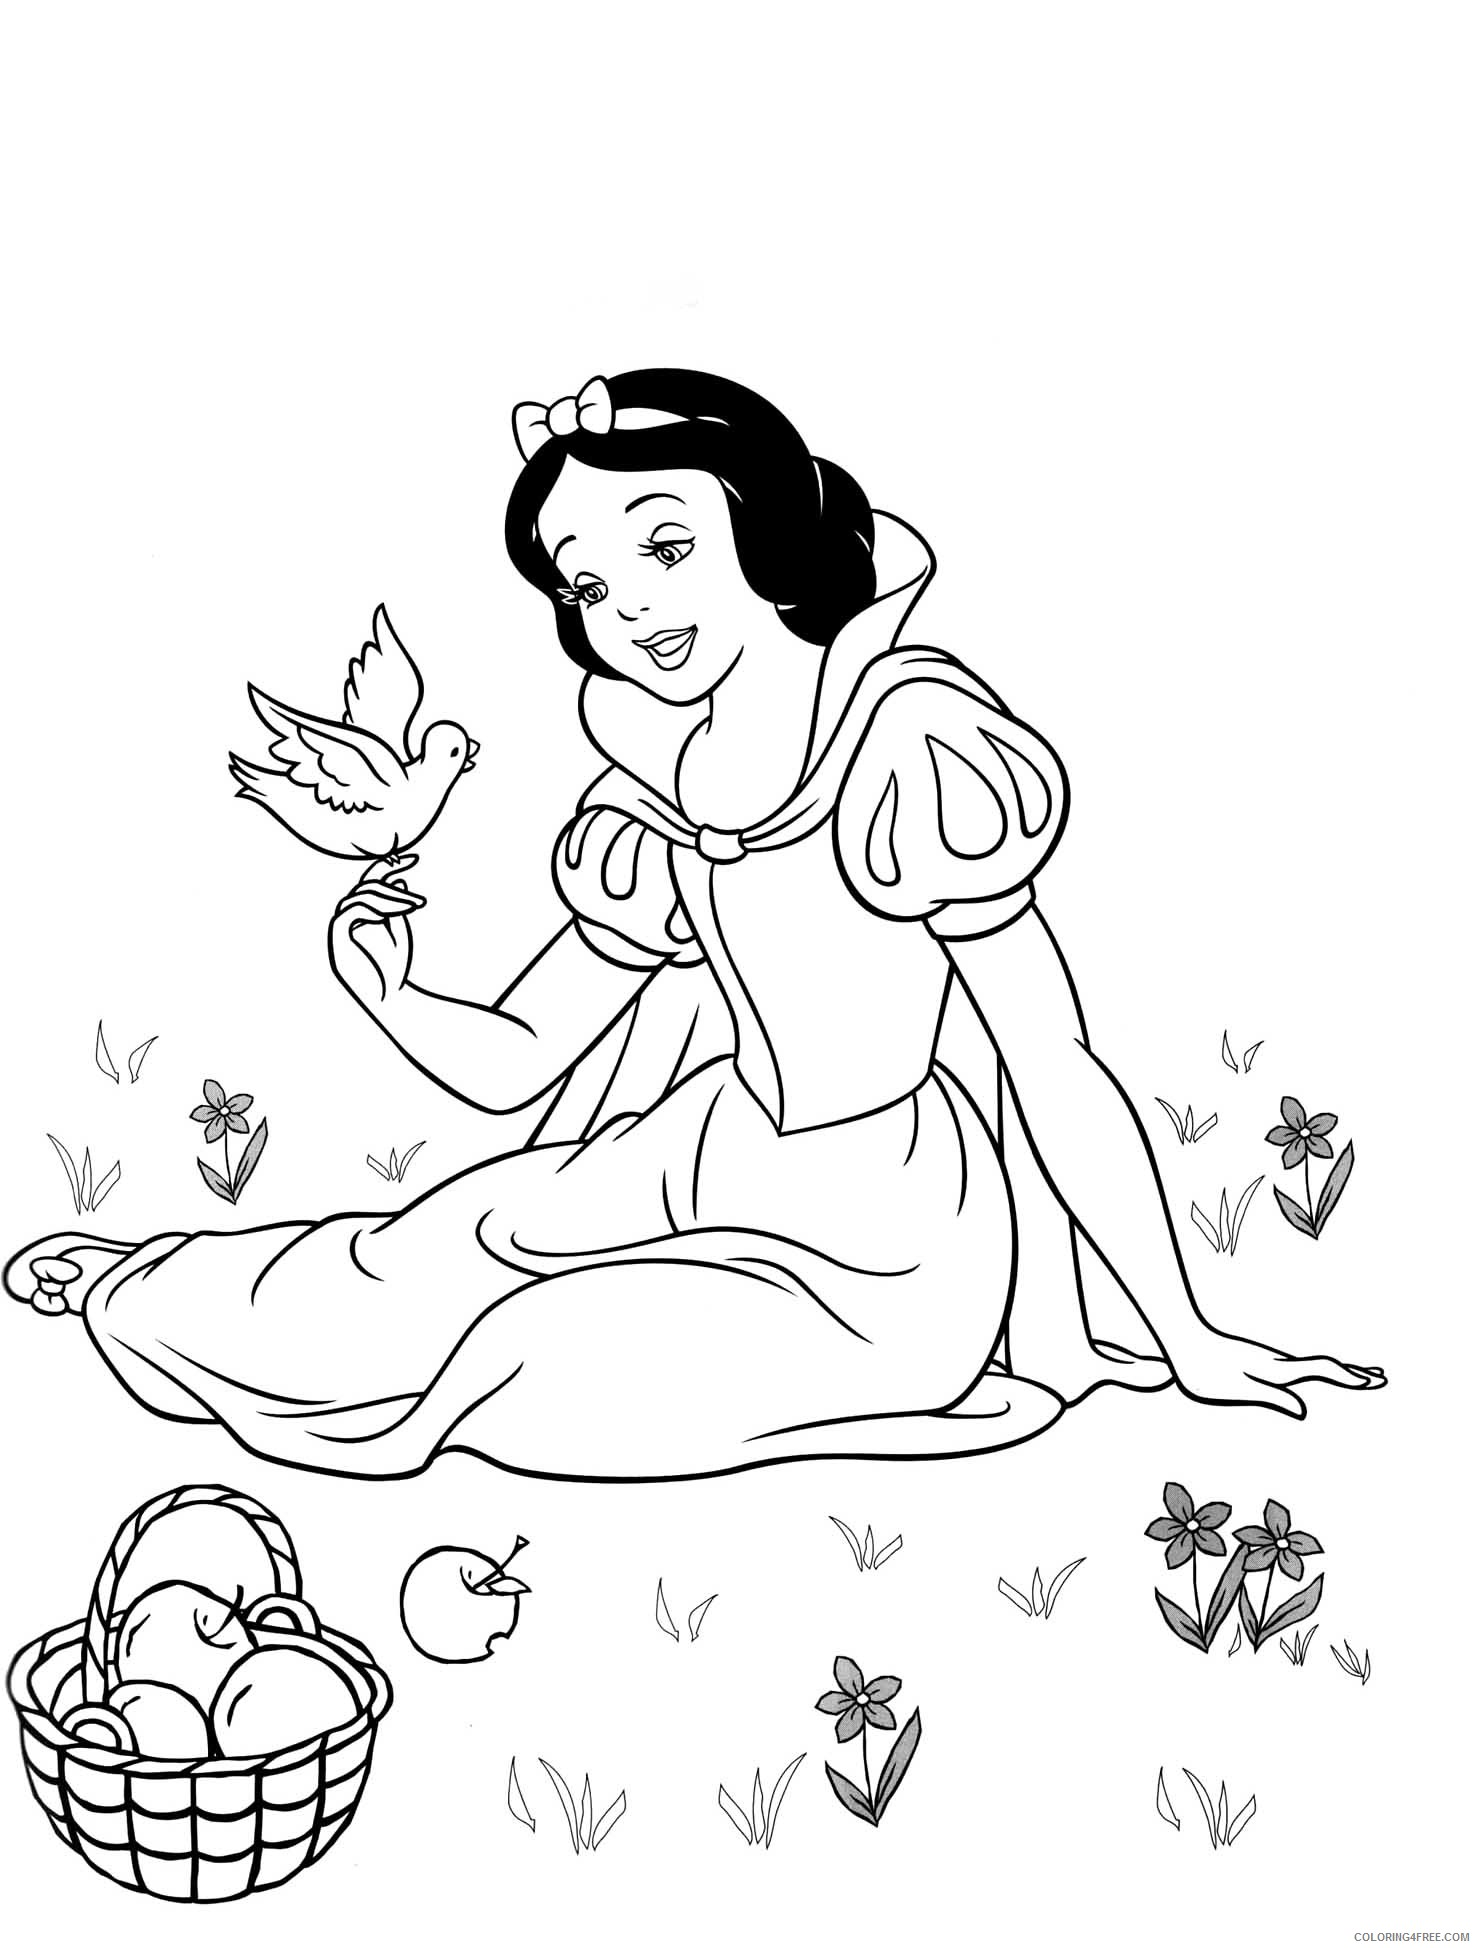 Disney Princess Coloring Pages - Find thousands of Disney Princess ... | 1948x1476